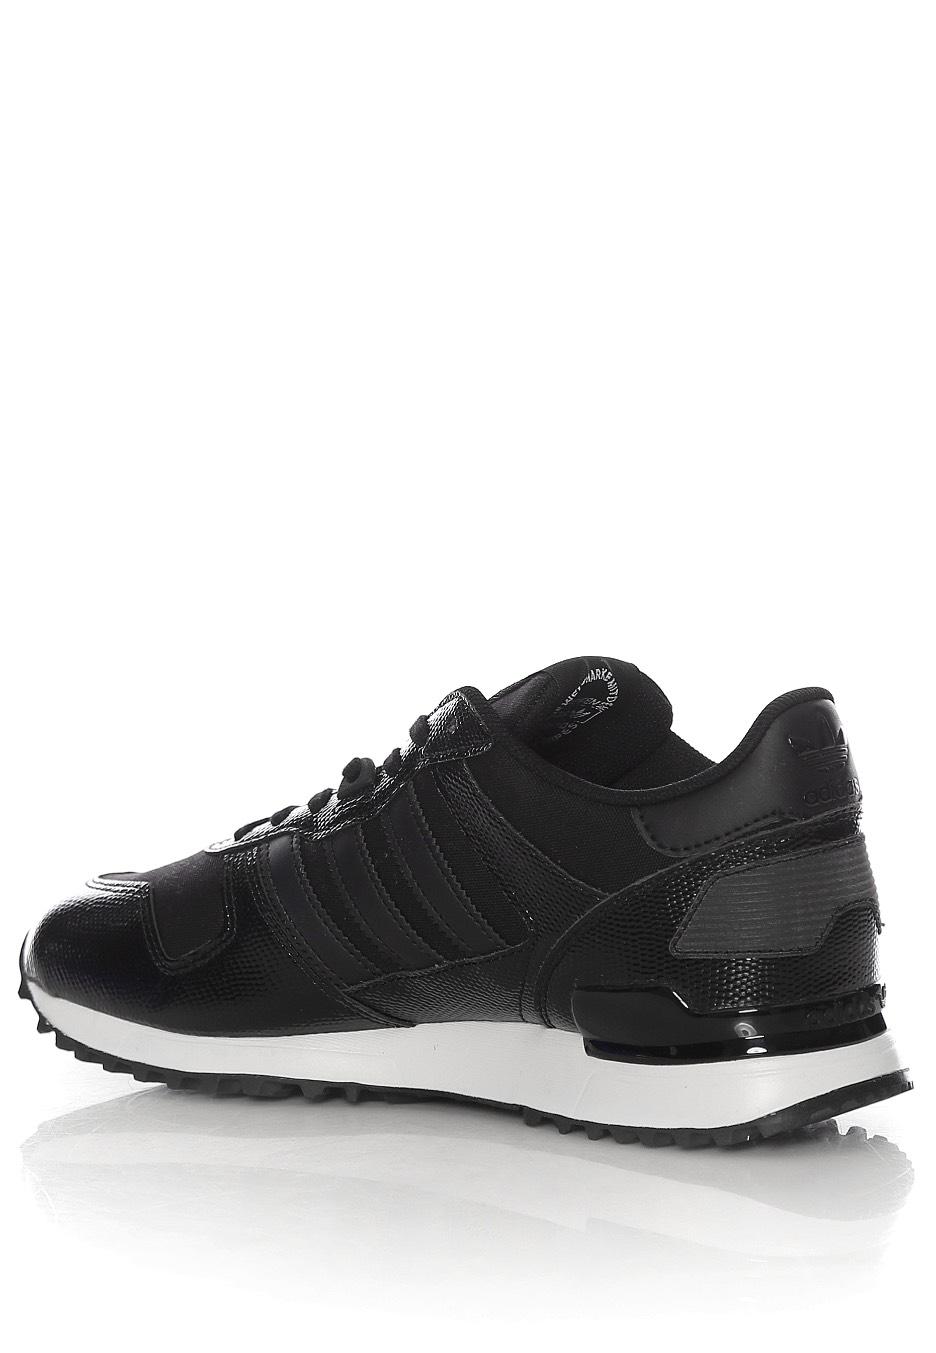 939e6bfbfde0 adidas_zx700w_coreblackcoreblkftwrwht_girlshoes_detail_lg.jpg